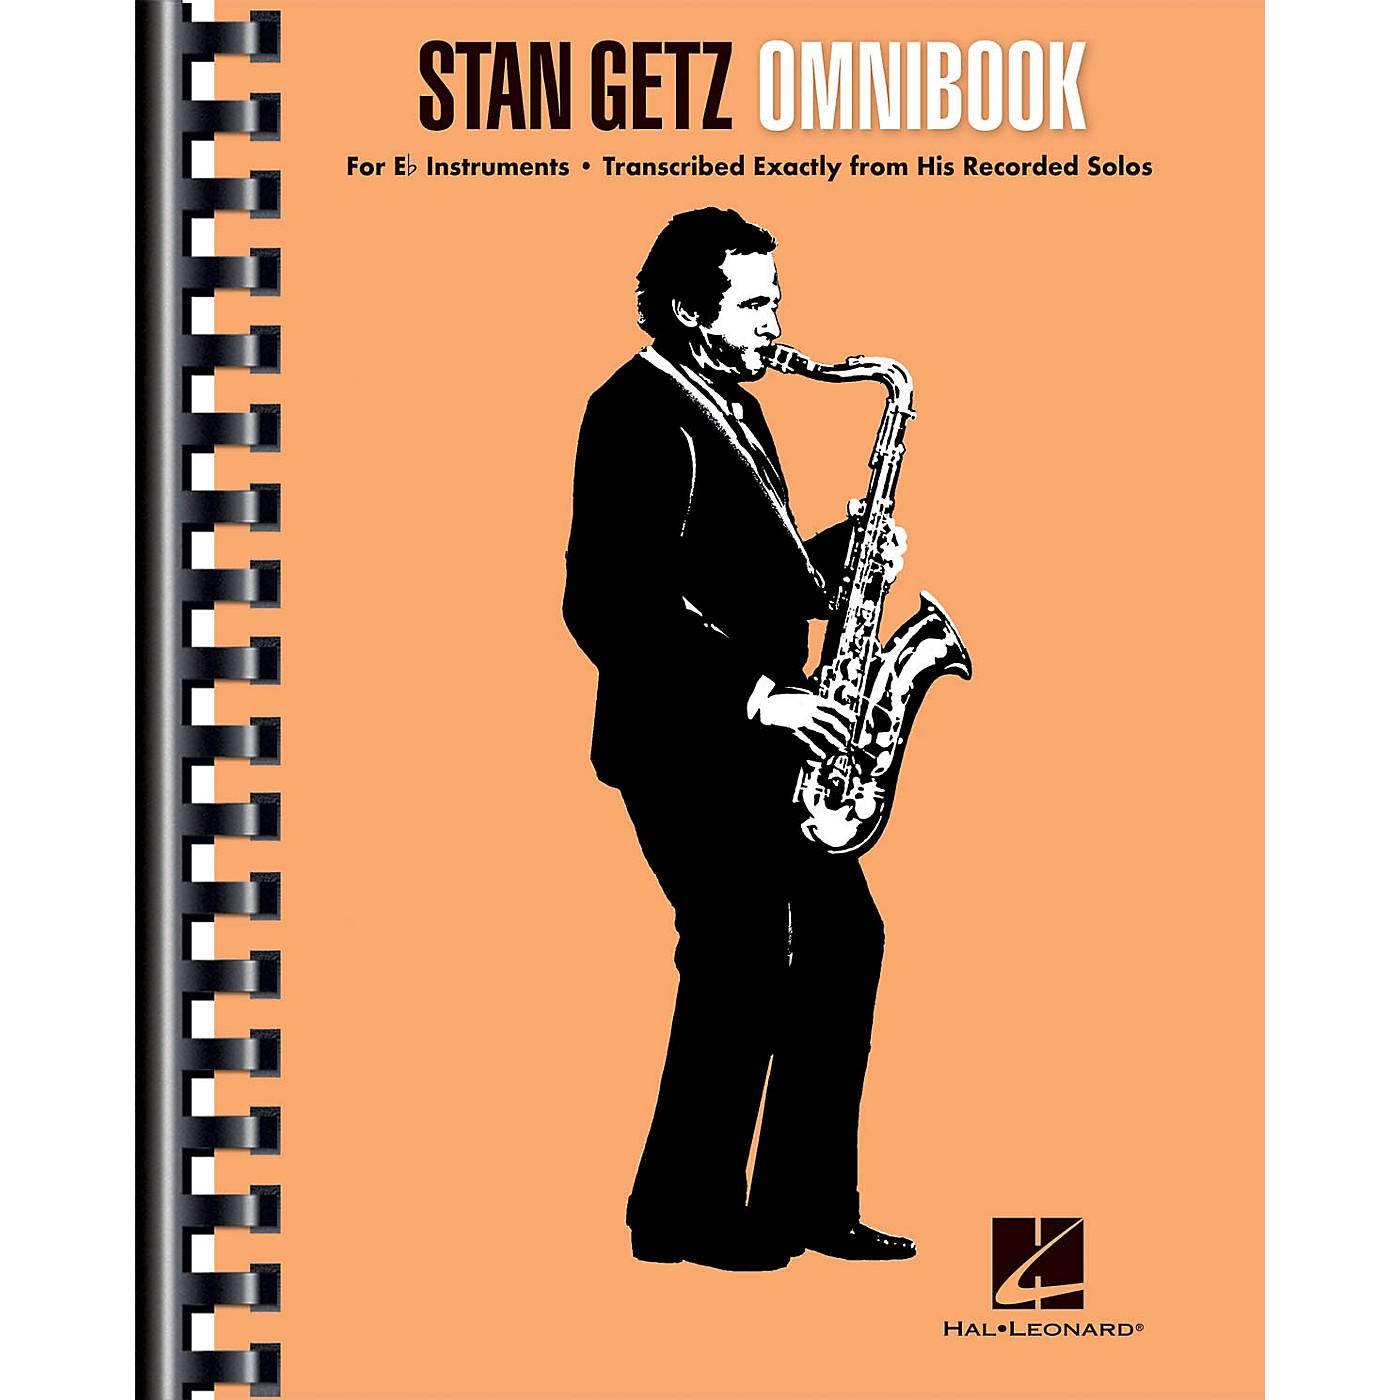 Hal Leonard Stan Getz - Omnibook For E-flat Instruments thumbnail